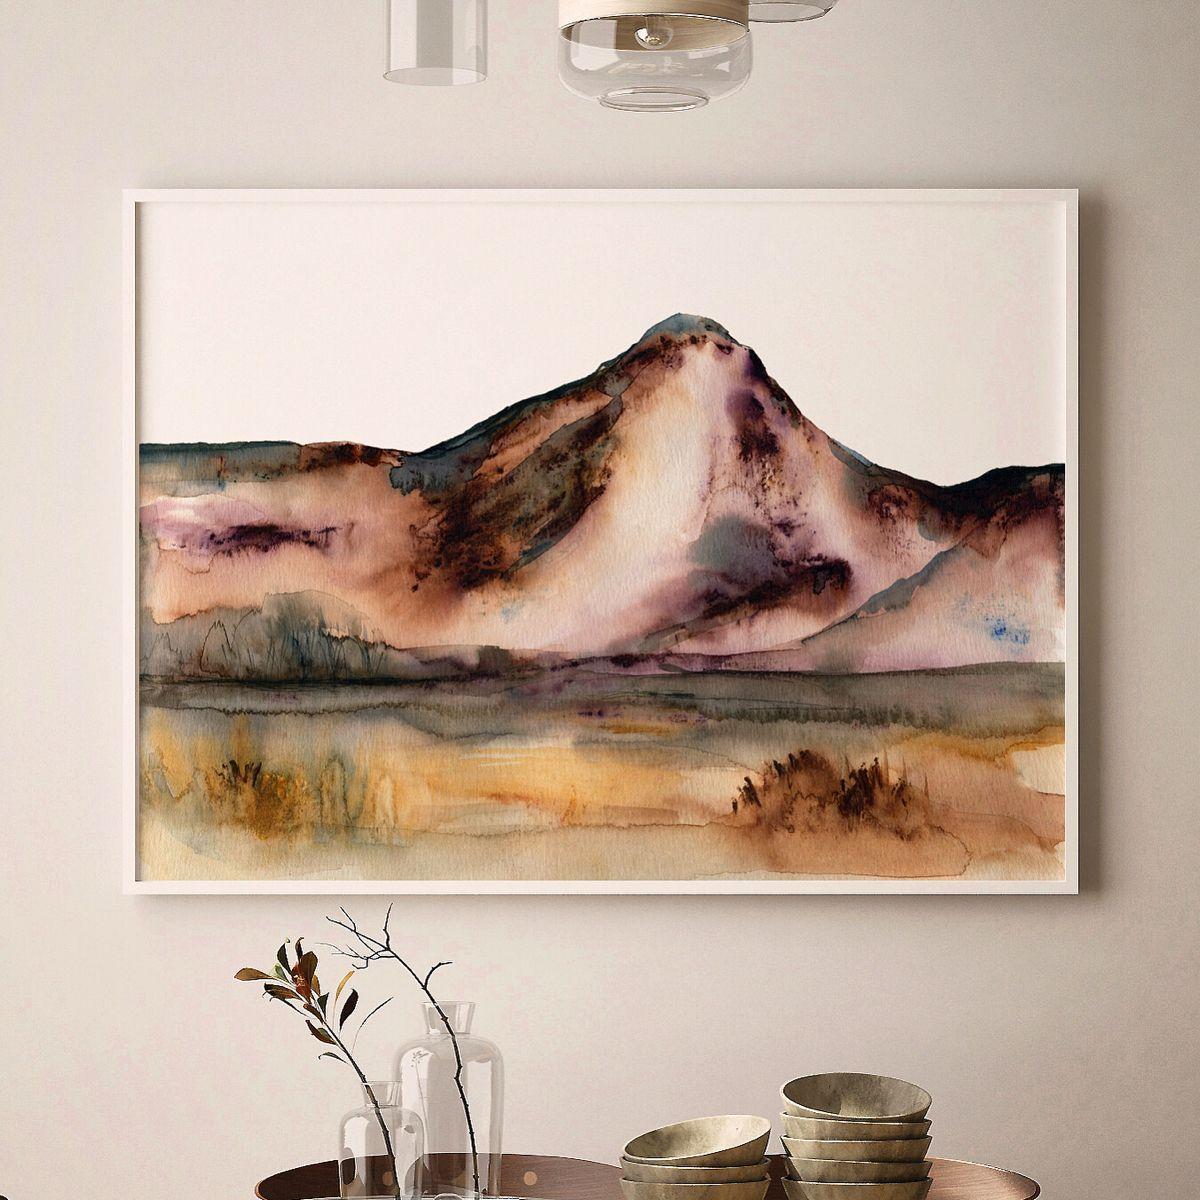 Watercolor Painting #desert #mountains #watercolorarts #etsy #hgtvmagazine #mintedartist